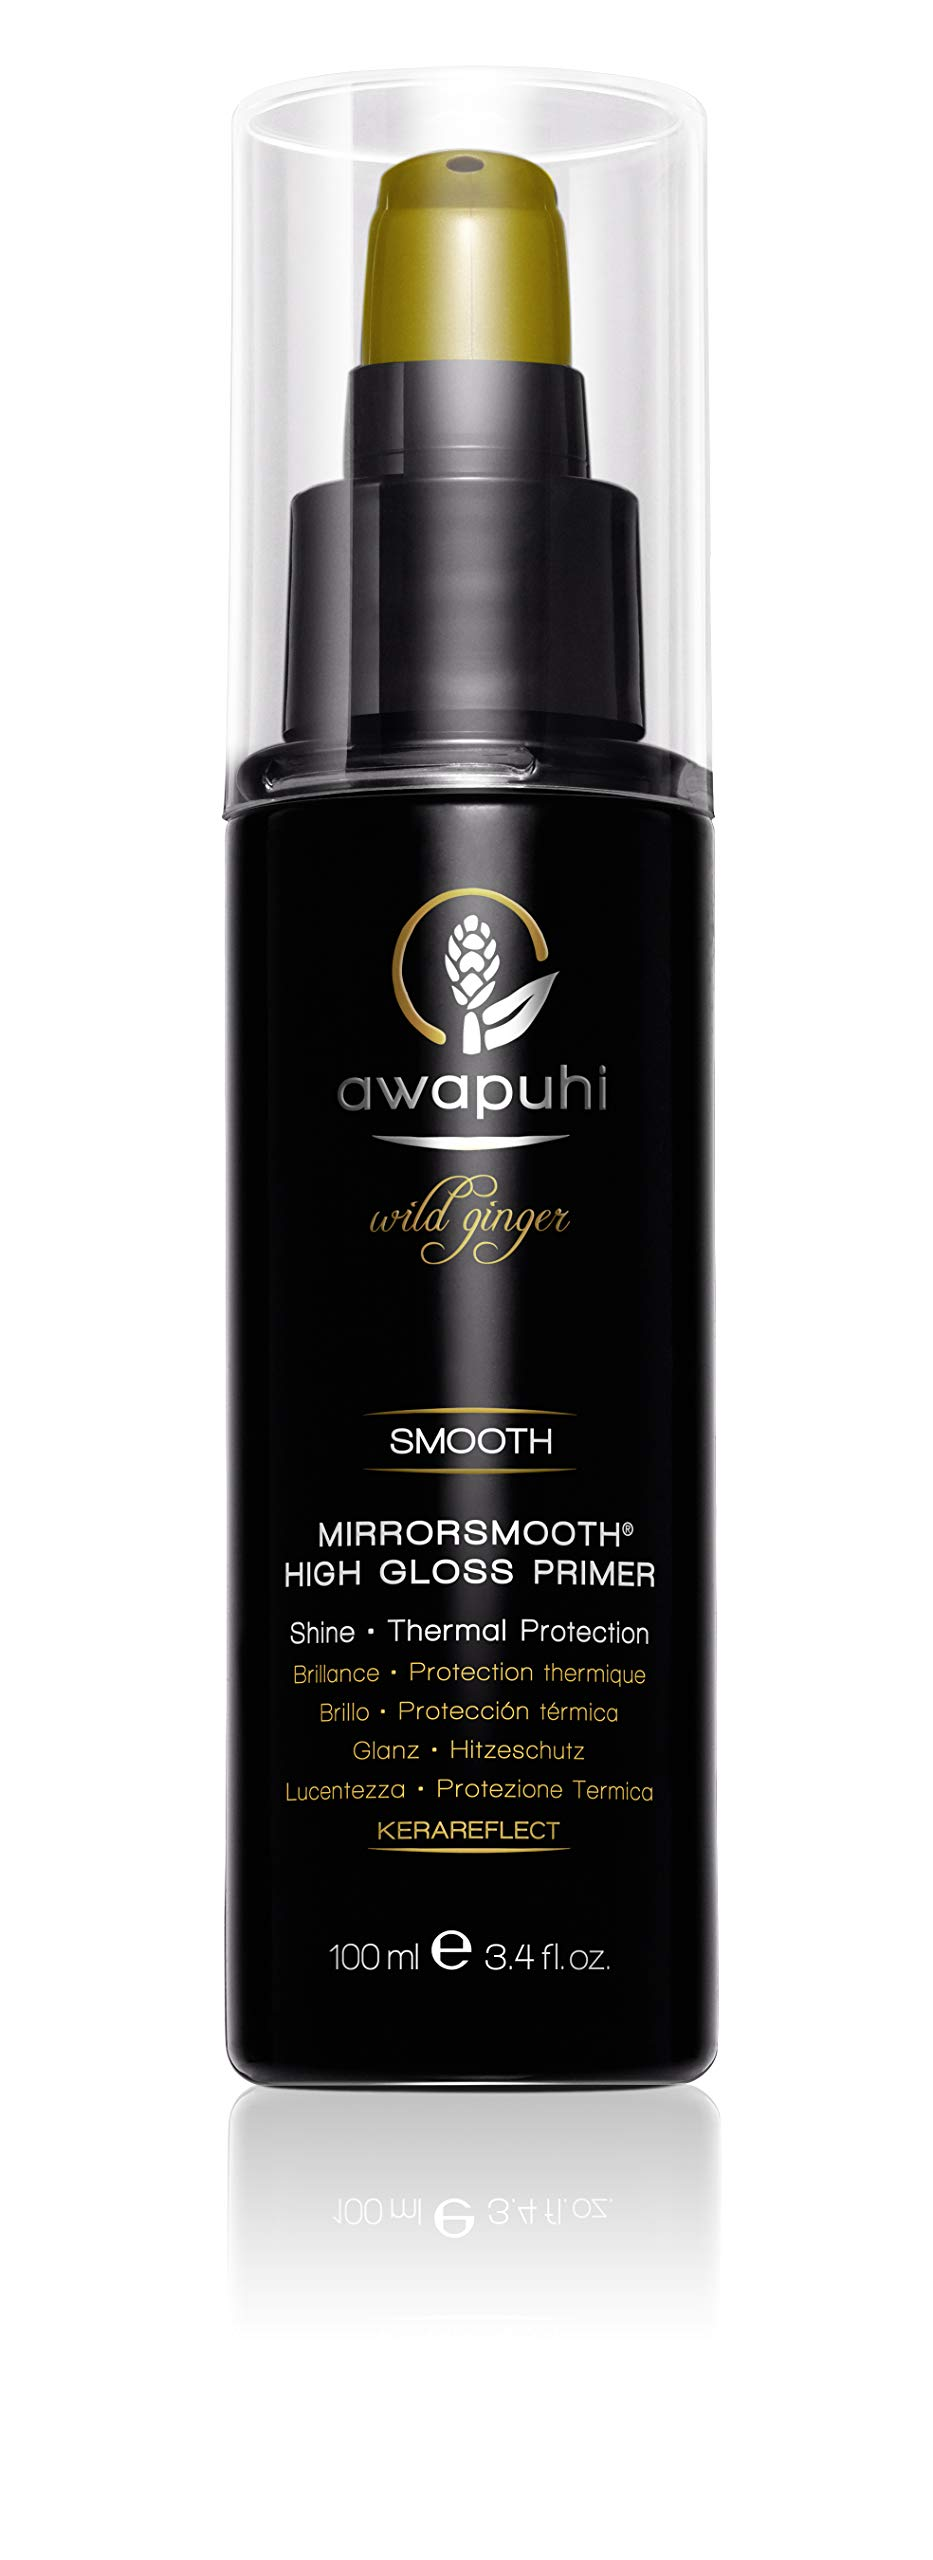 Awapuhi Wild Ginger MirrorSmooth High Gloss Primer, 3.4 Fl Oz by Awapuhi Wild Ginger